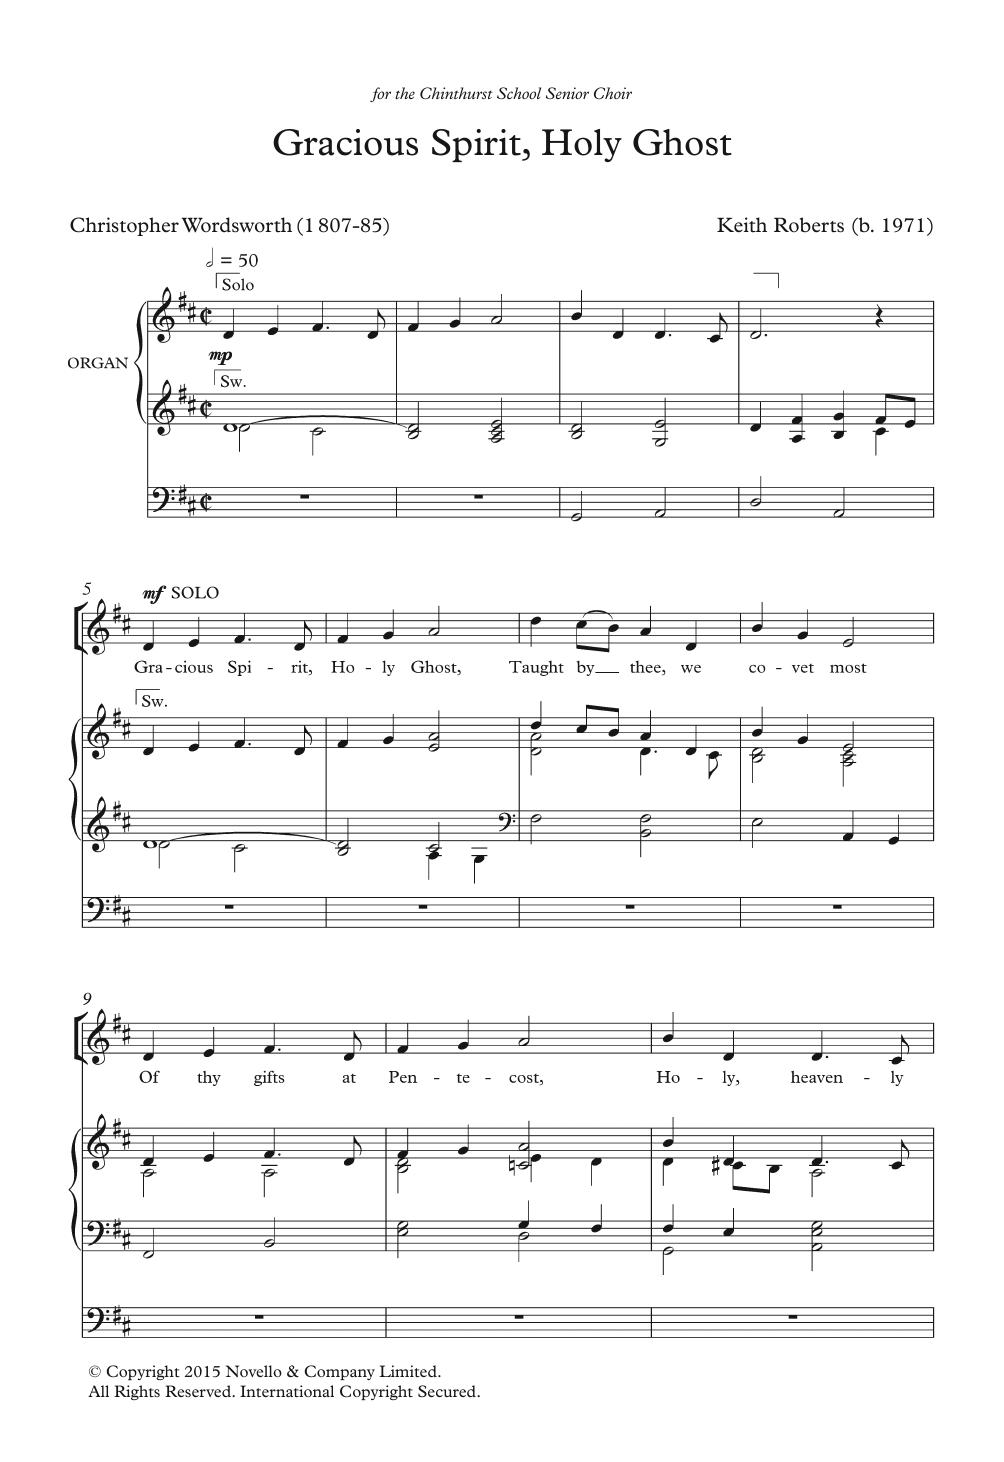 Gracious Spirit, Holy Ghost Sheet Music